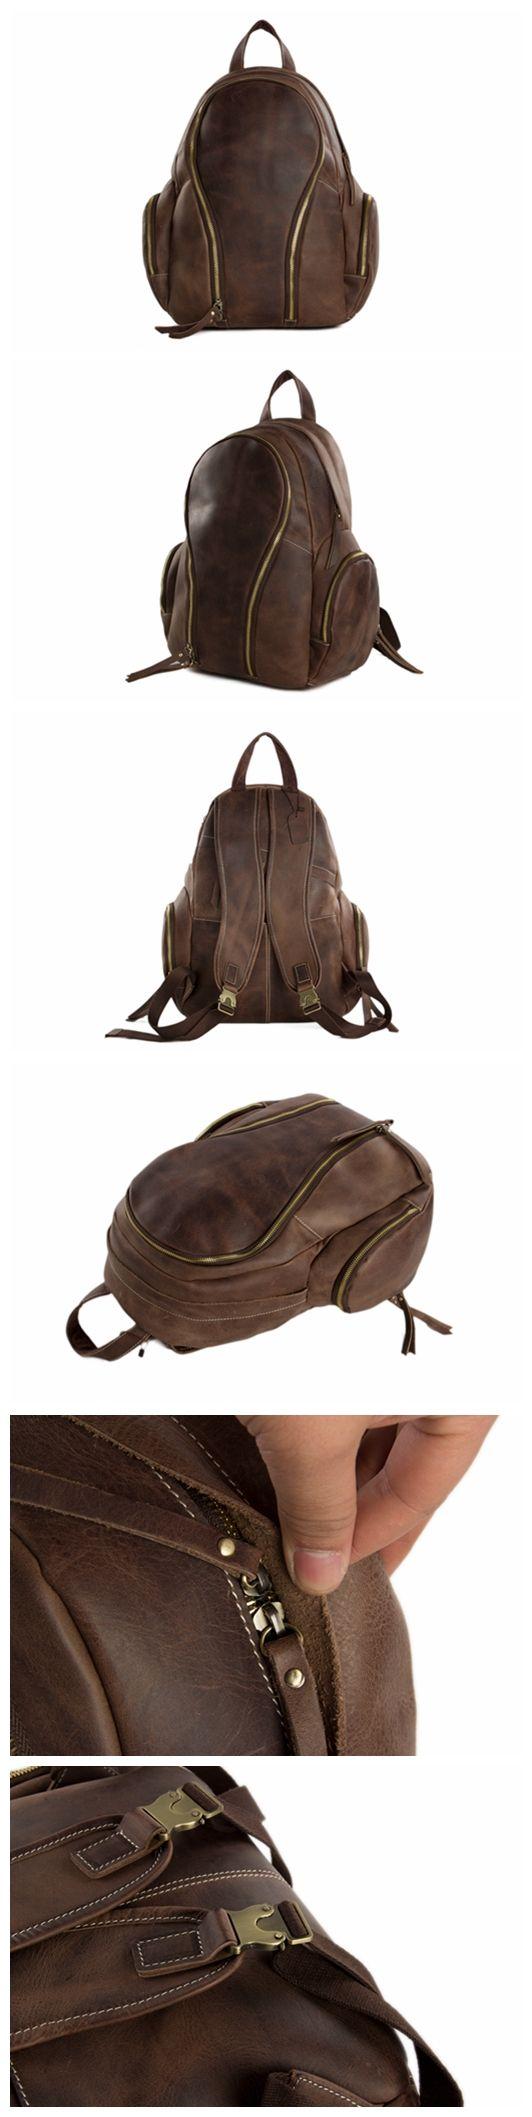 Handcrafted Genuine Leather Backpack Travel Backpack,Laptop Bag, School Backpack